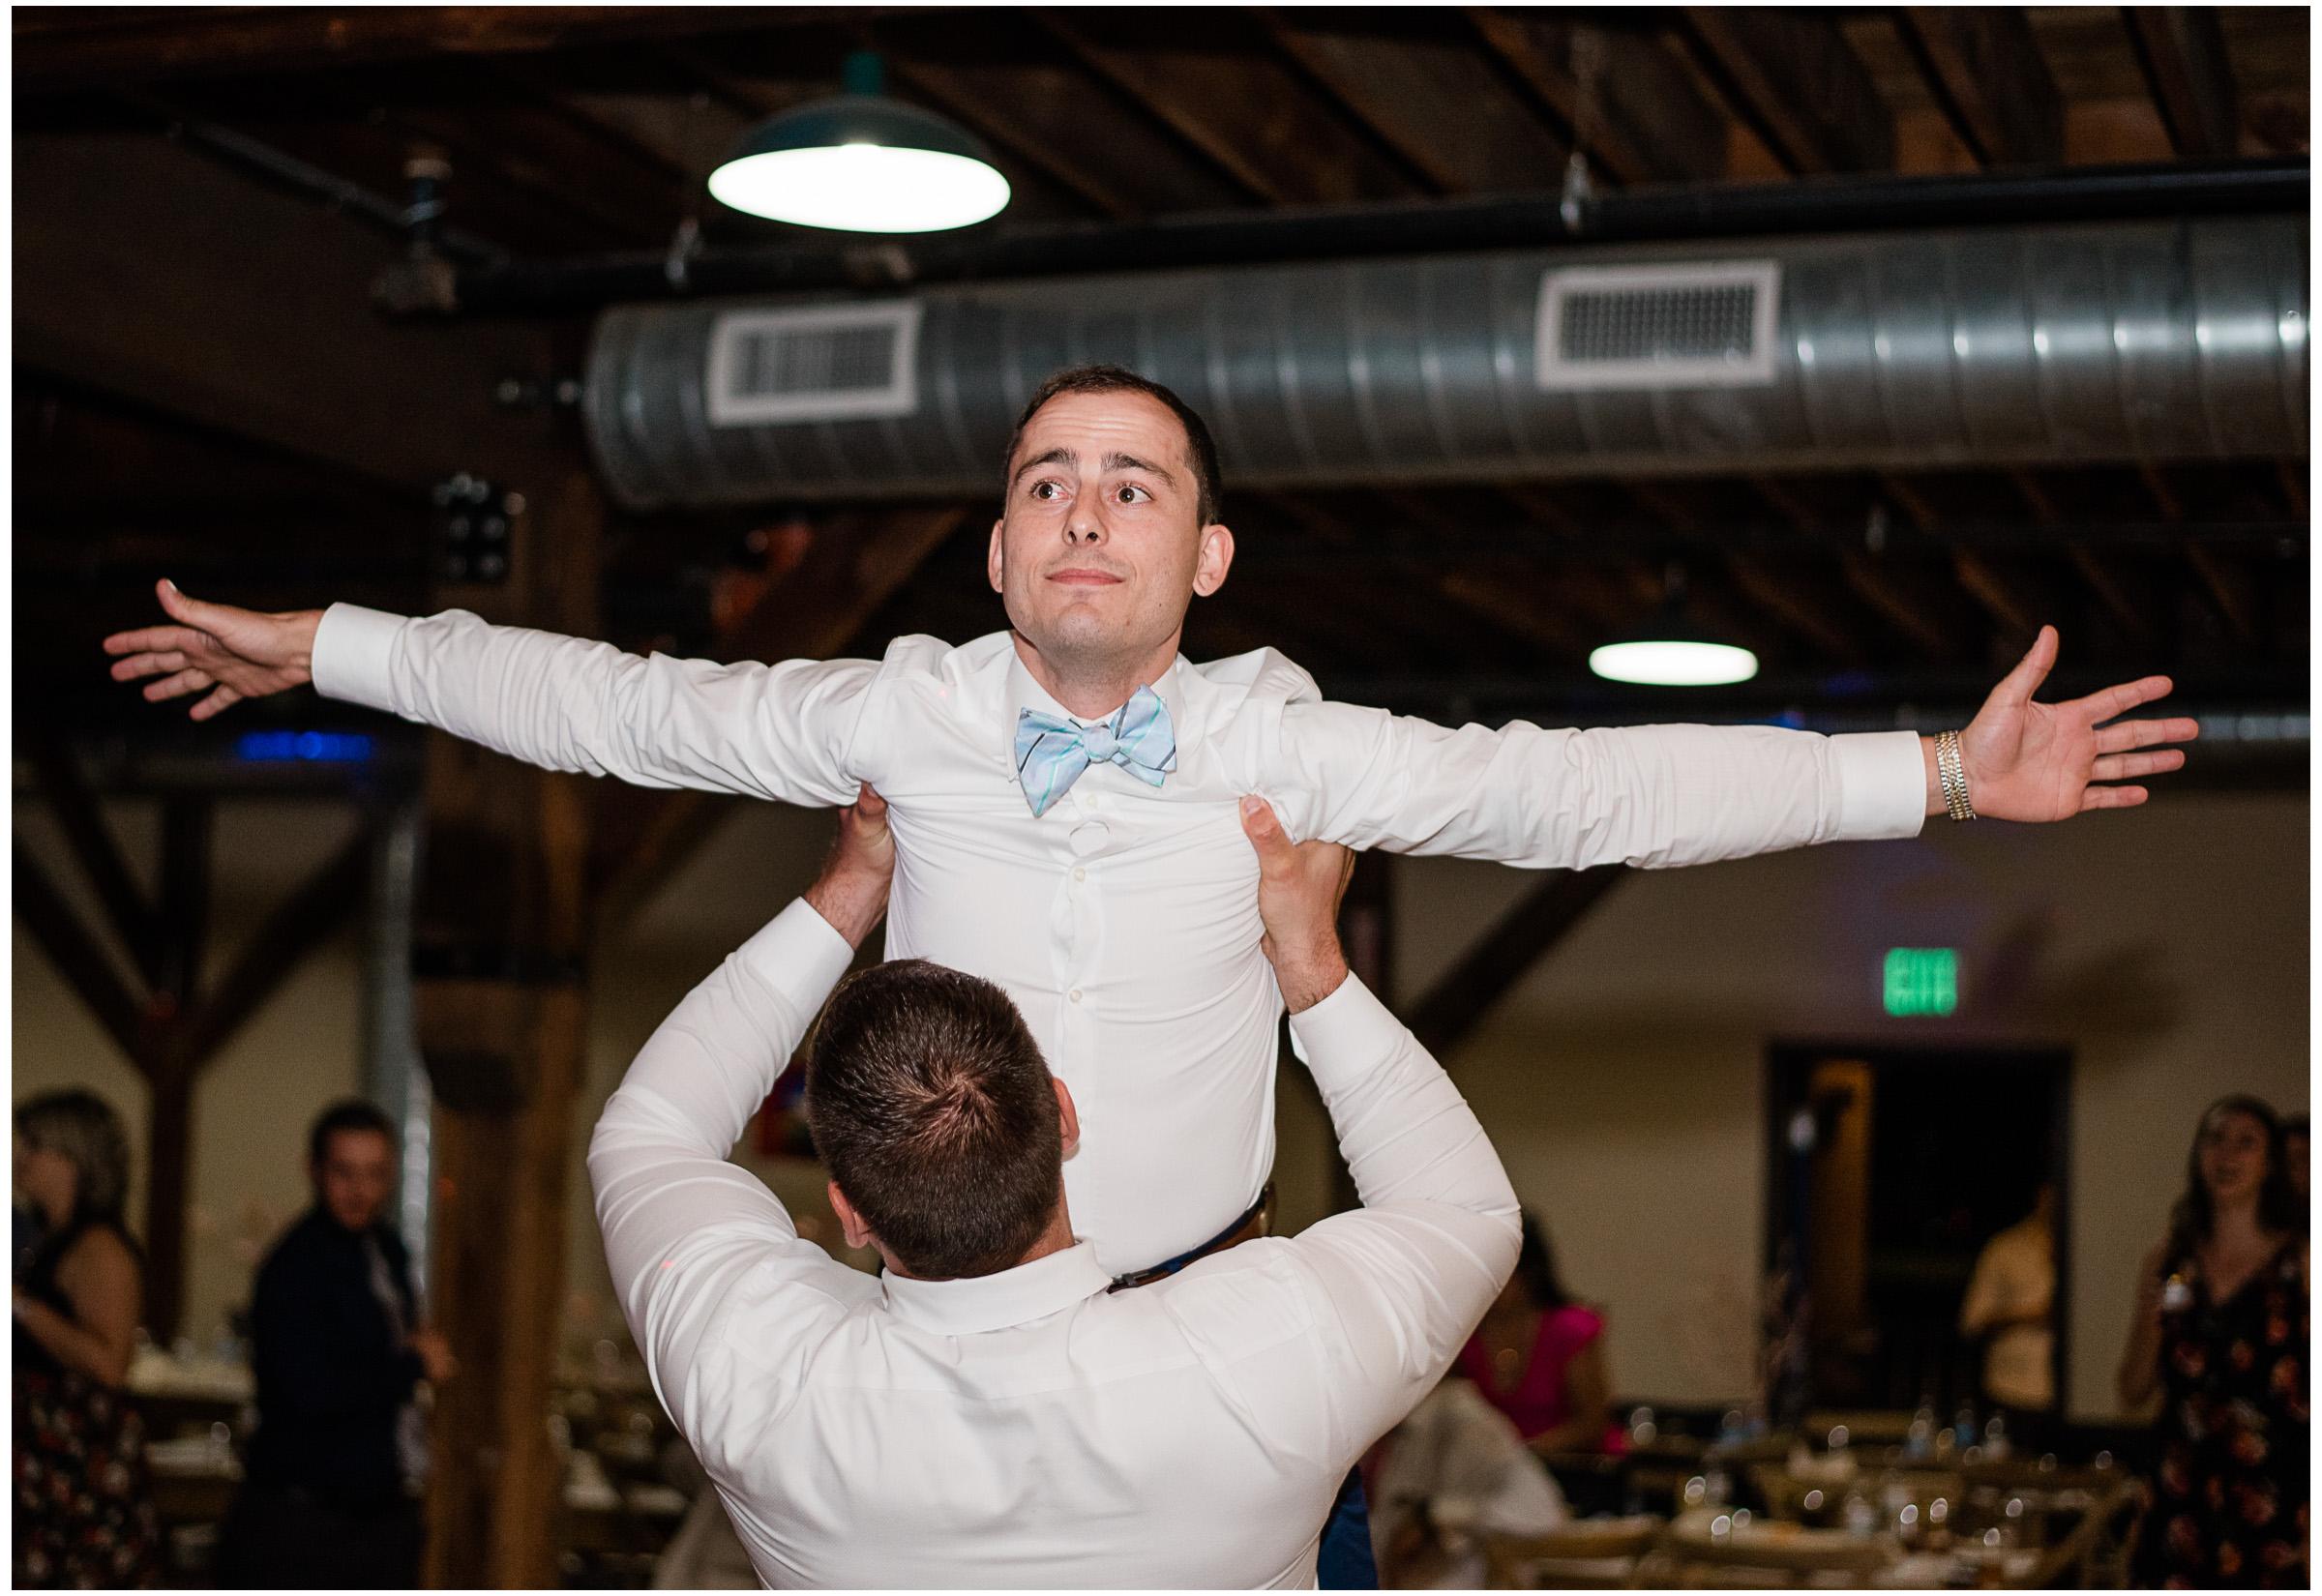 Loomis Wedding - Sacramento Photographer - Blue Goose - Justin Wilcox Photography - 25.jpg